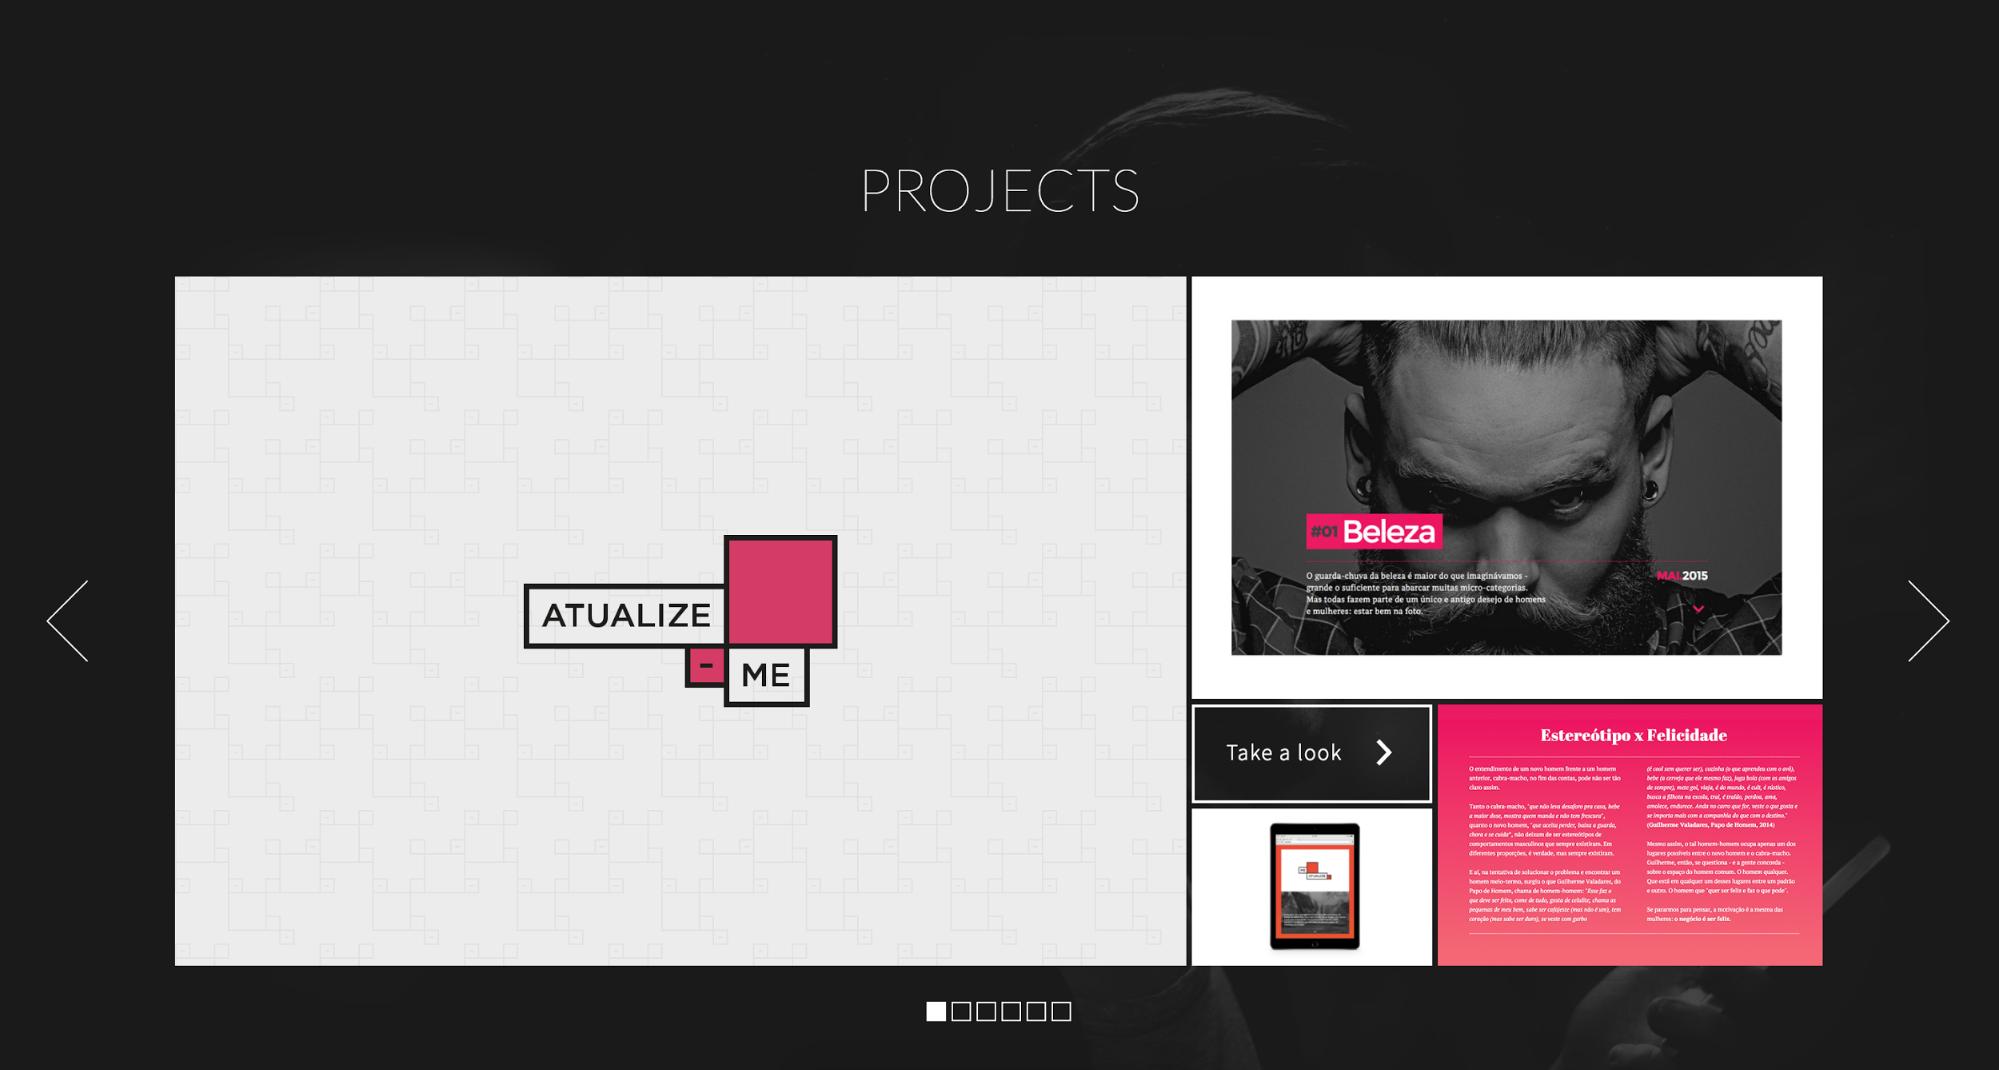 Carousel/slider design best practices | Webflow Blog